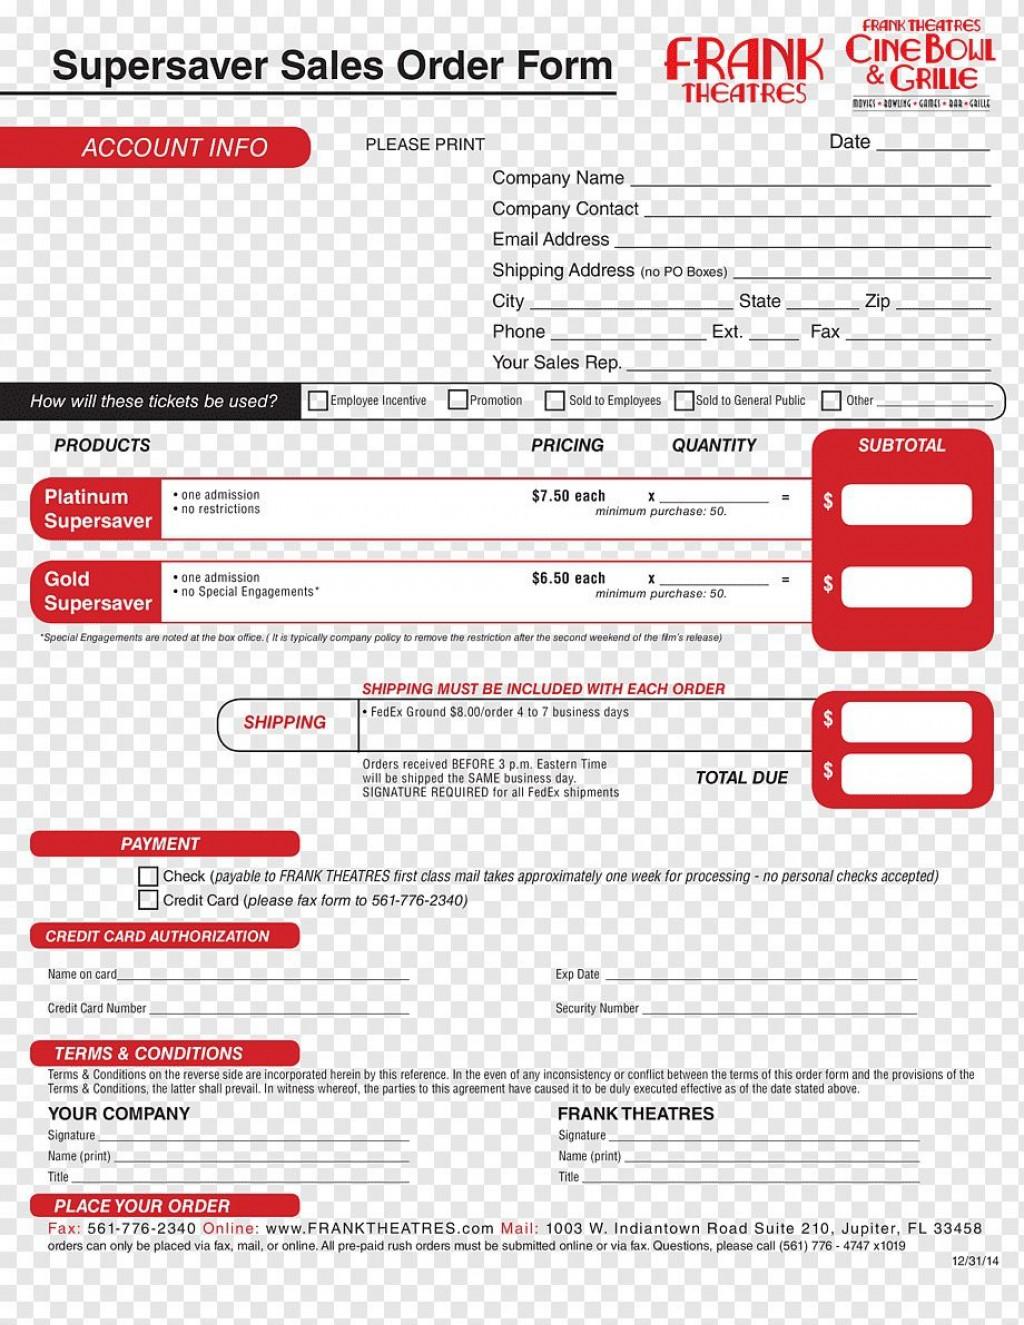 006 Shocking Sale Order Form Template Inspiration  Templates Excel Word Free OnlineLarge